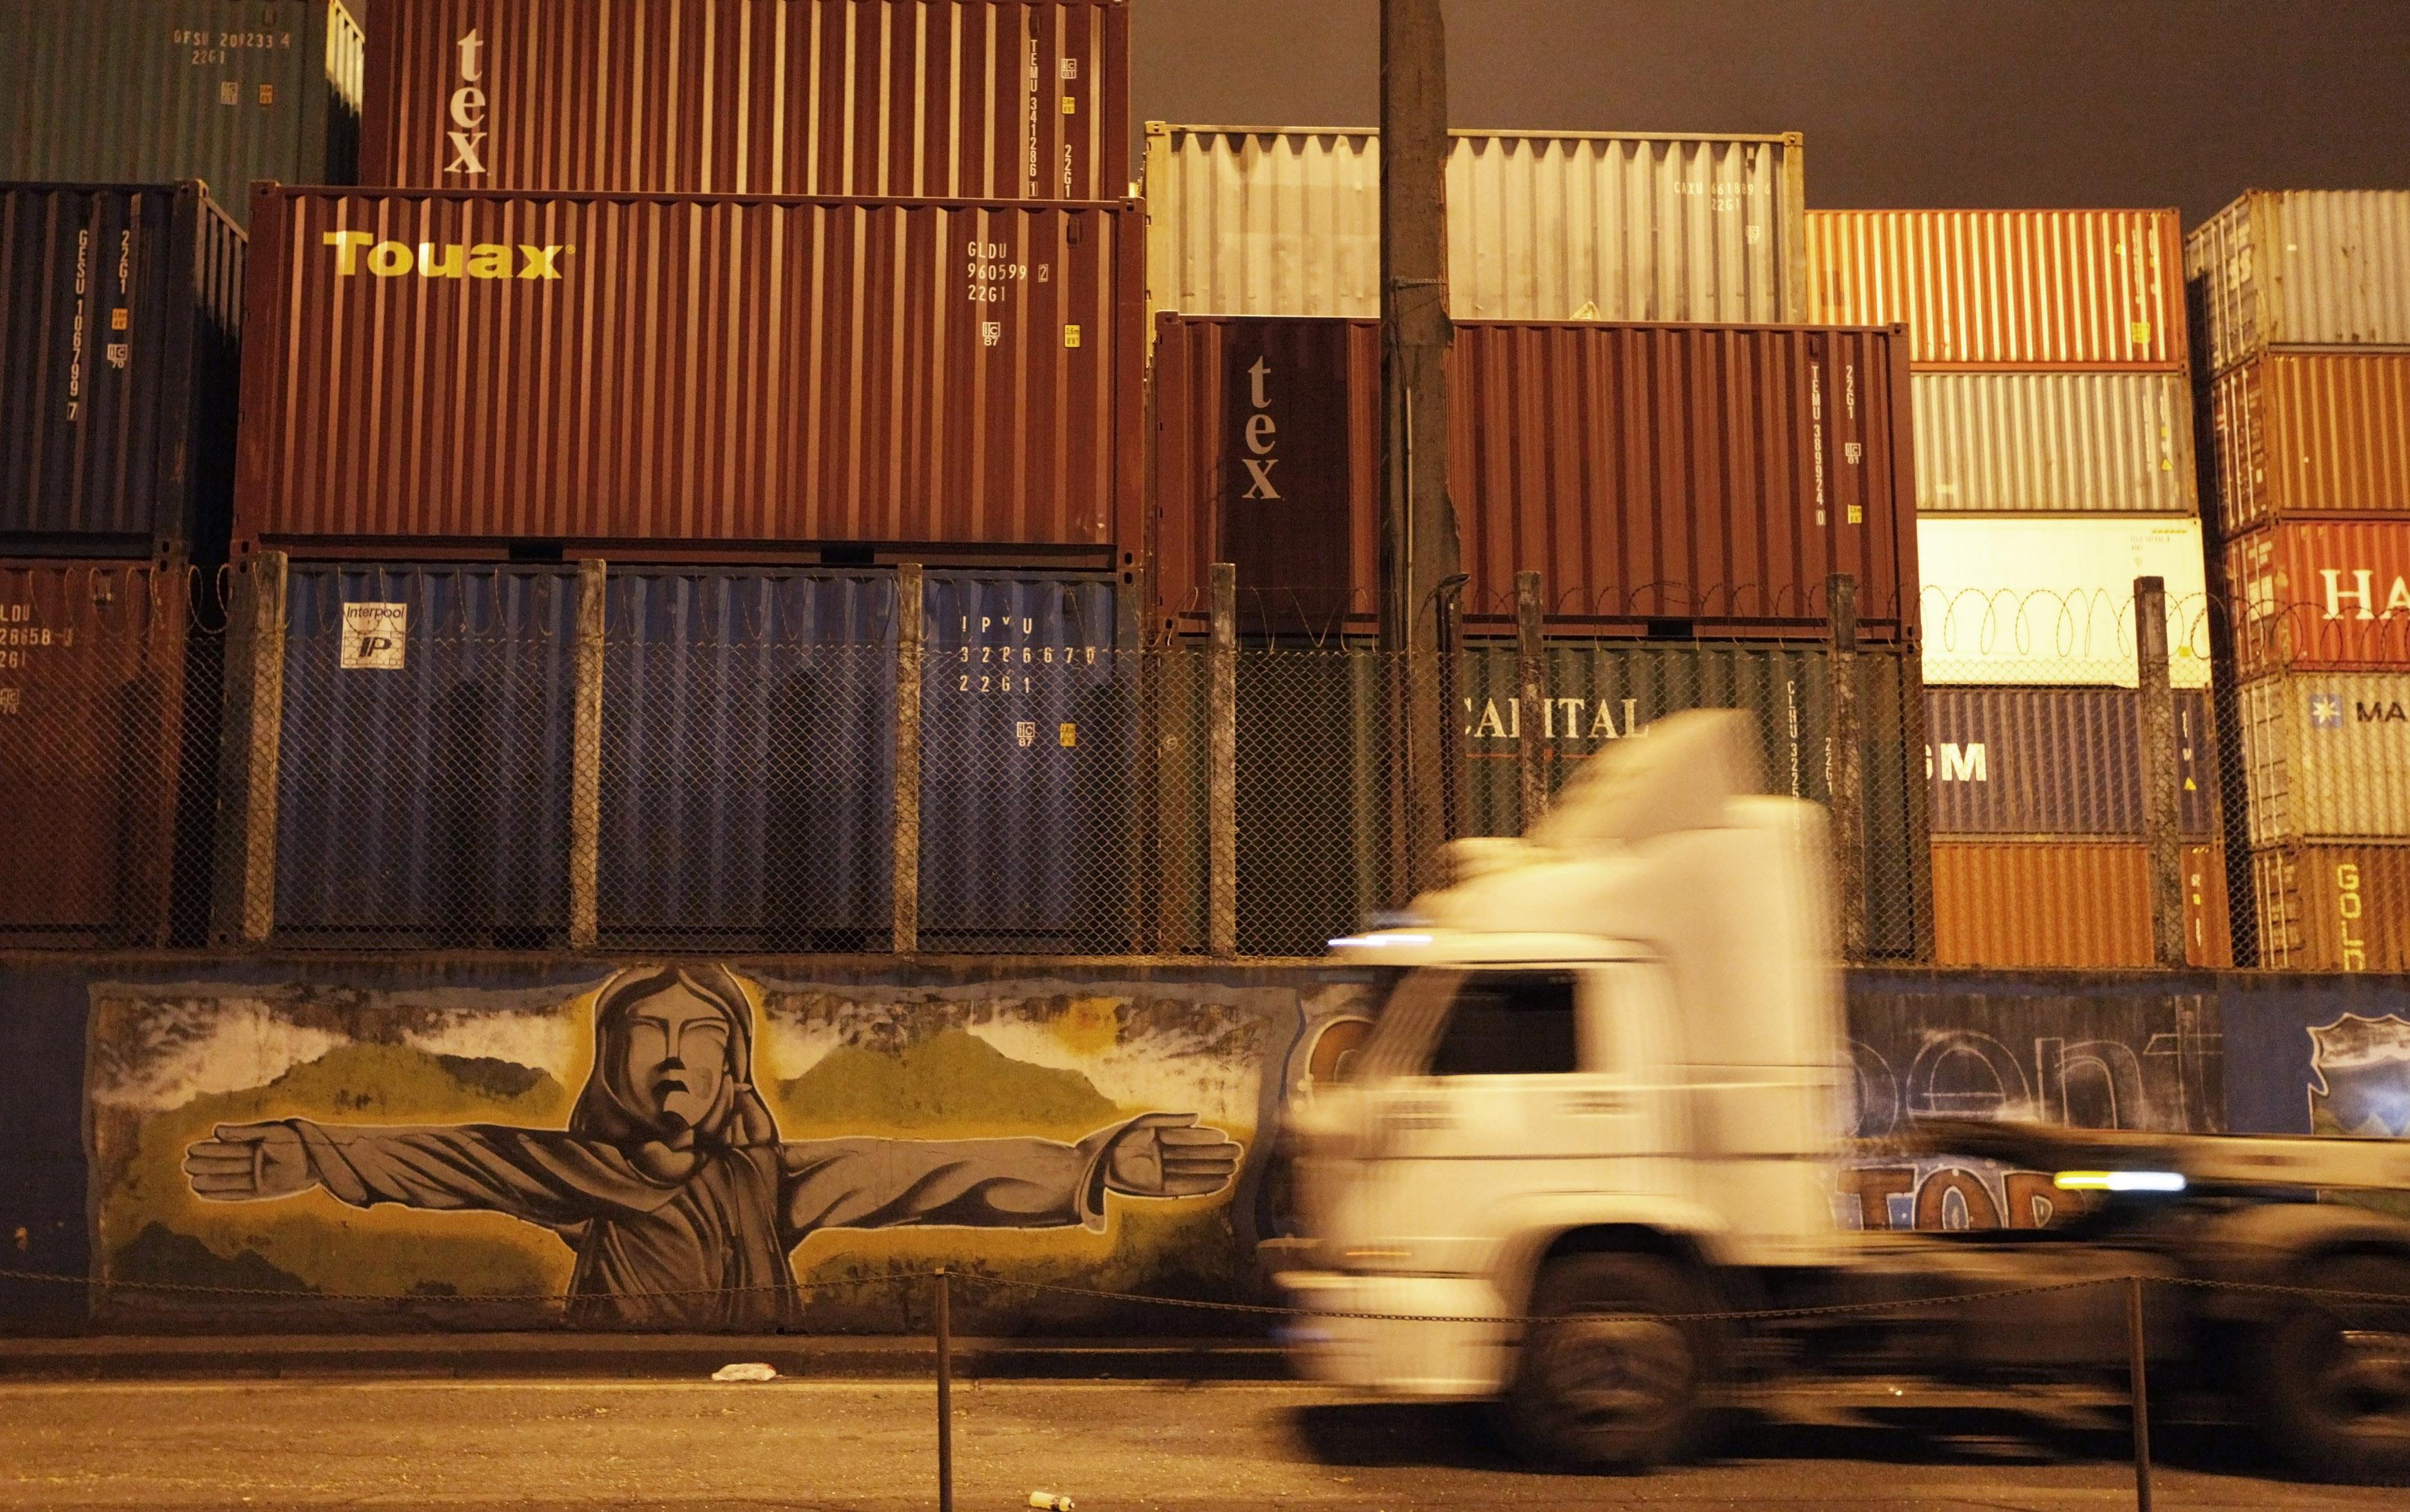 truck_brazil001